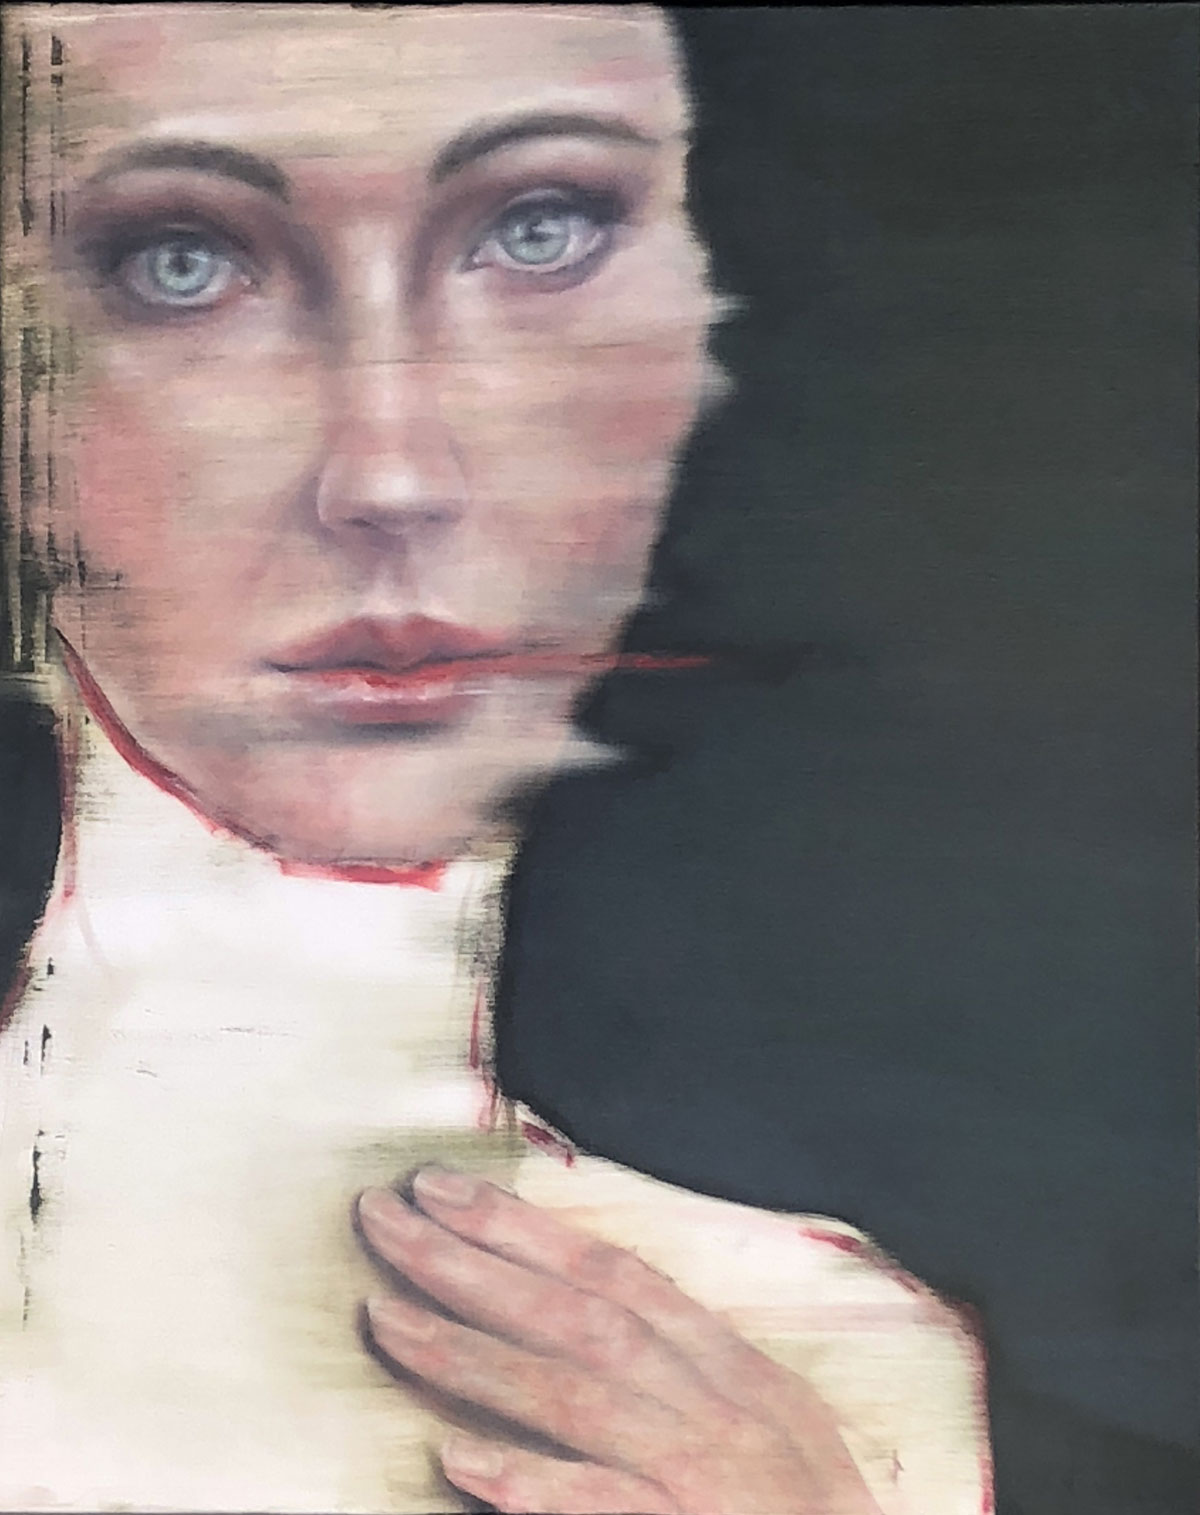 Silke Aurora, Layers of empathy, oil on canvas, 100 x 80 cm